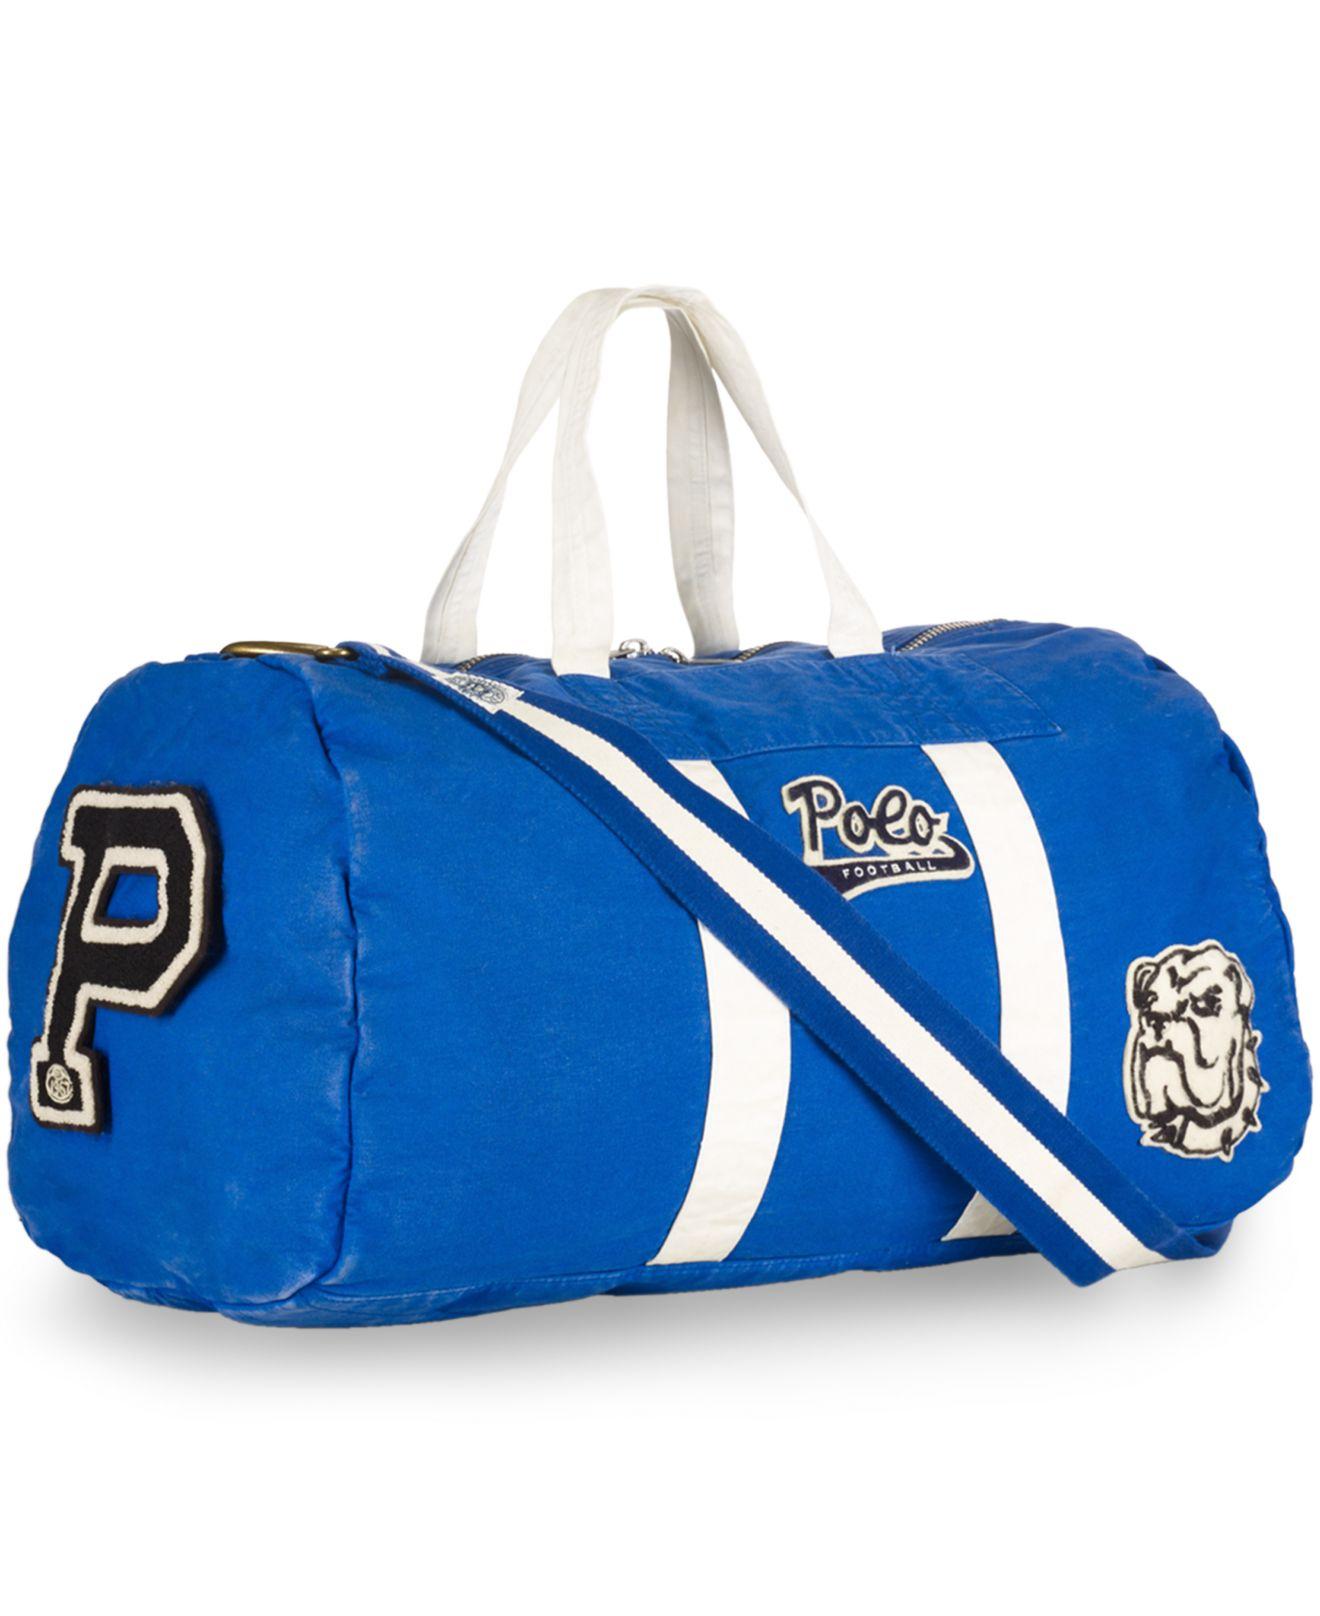 5e0da74a8889 Lyst - Polo Ralph Lauren Canvas Football Duffel Bag in Blue for Men